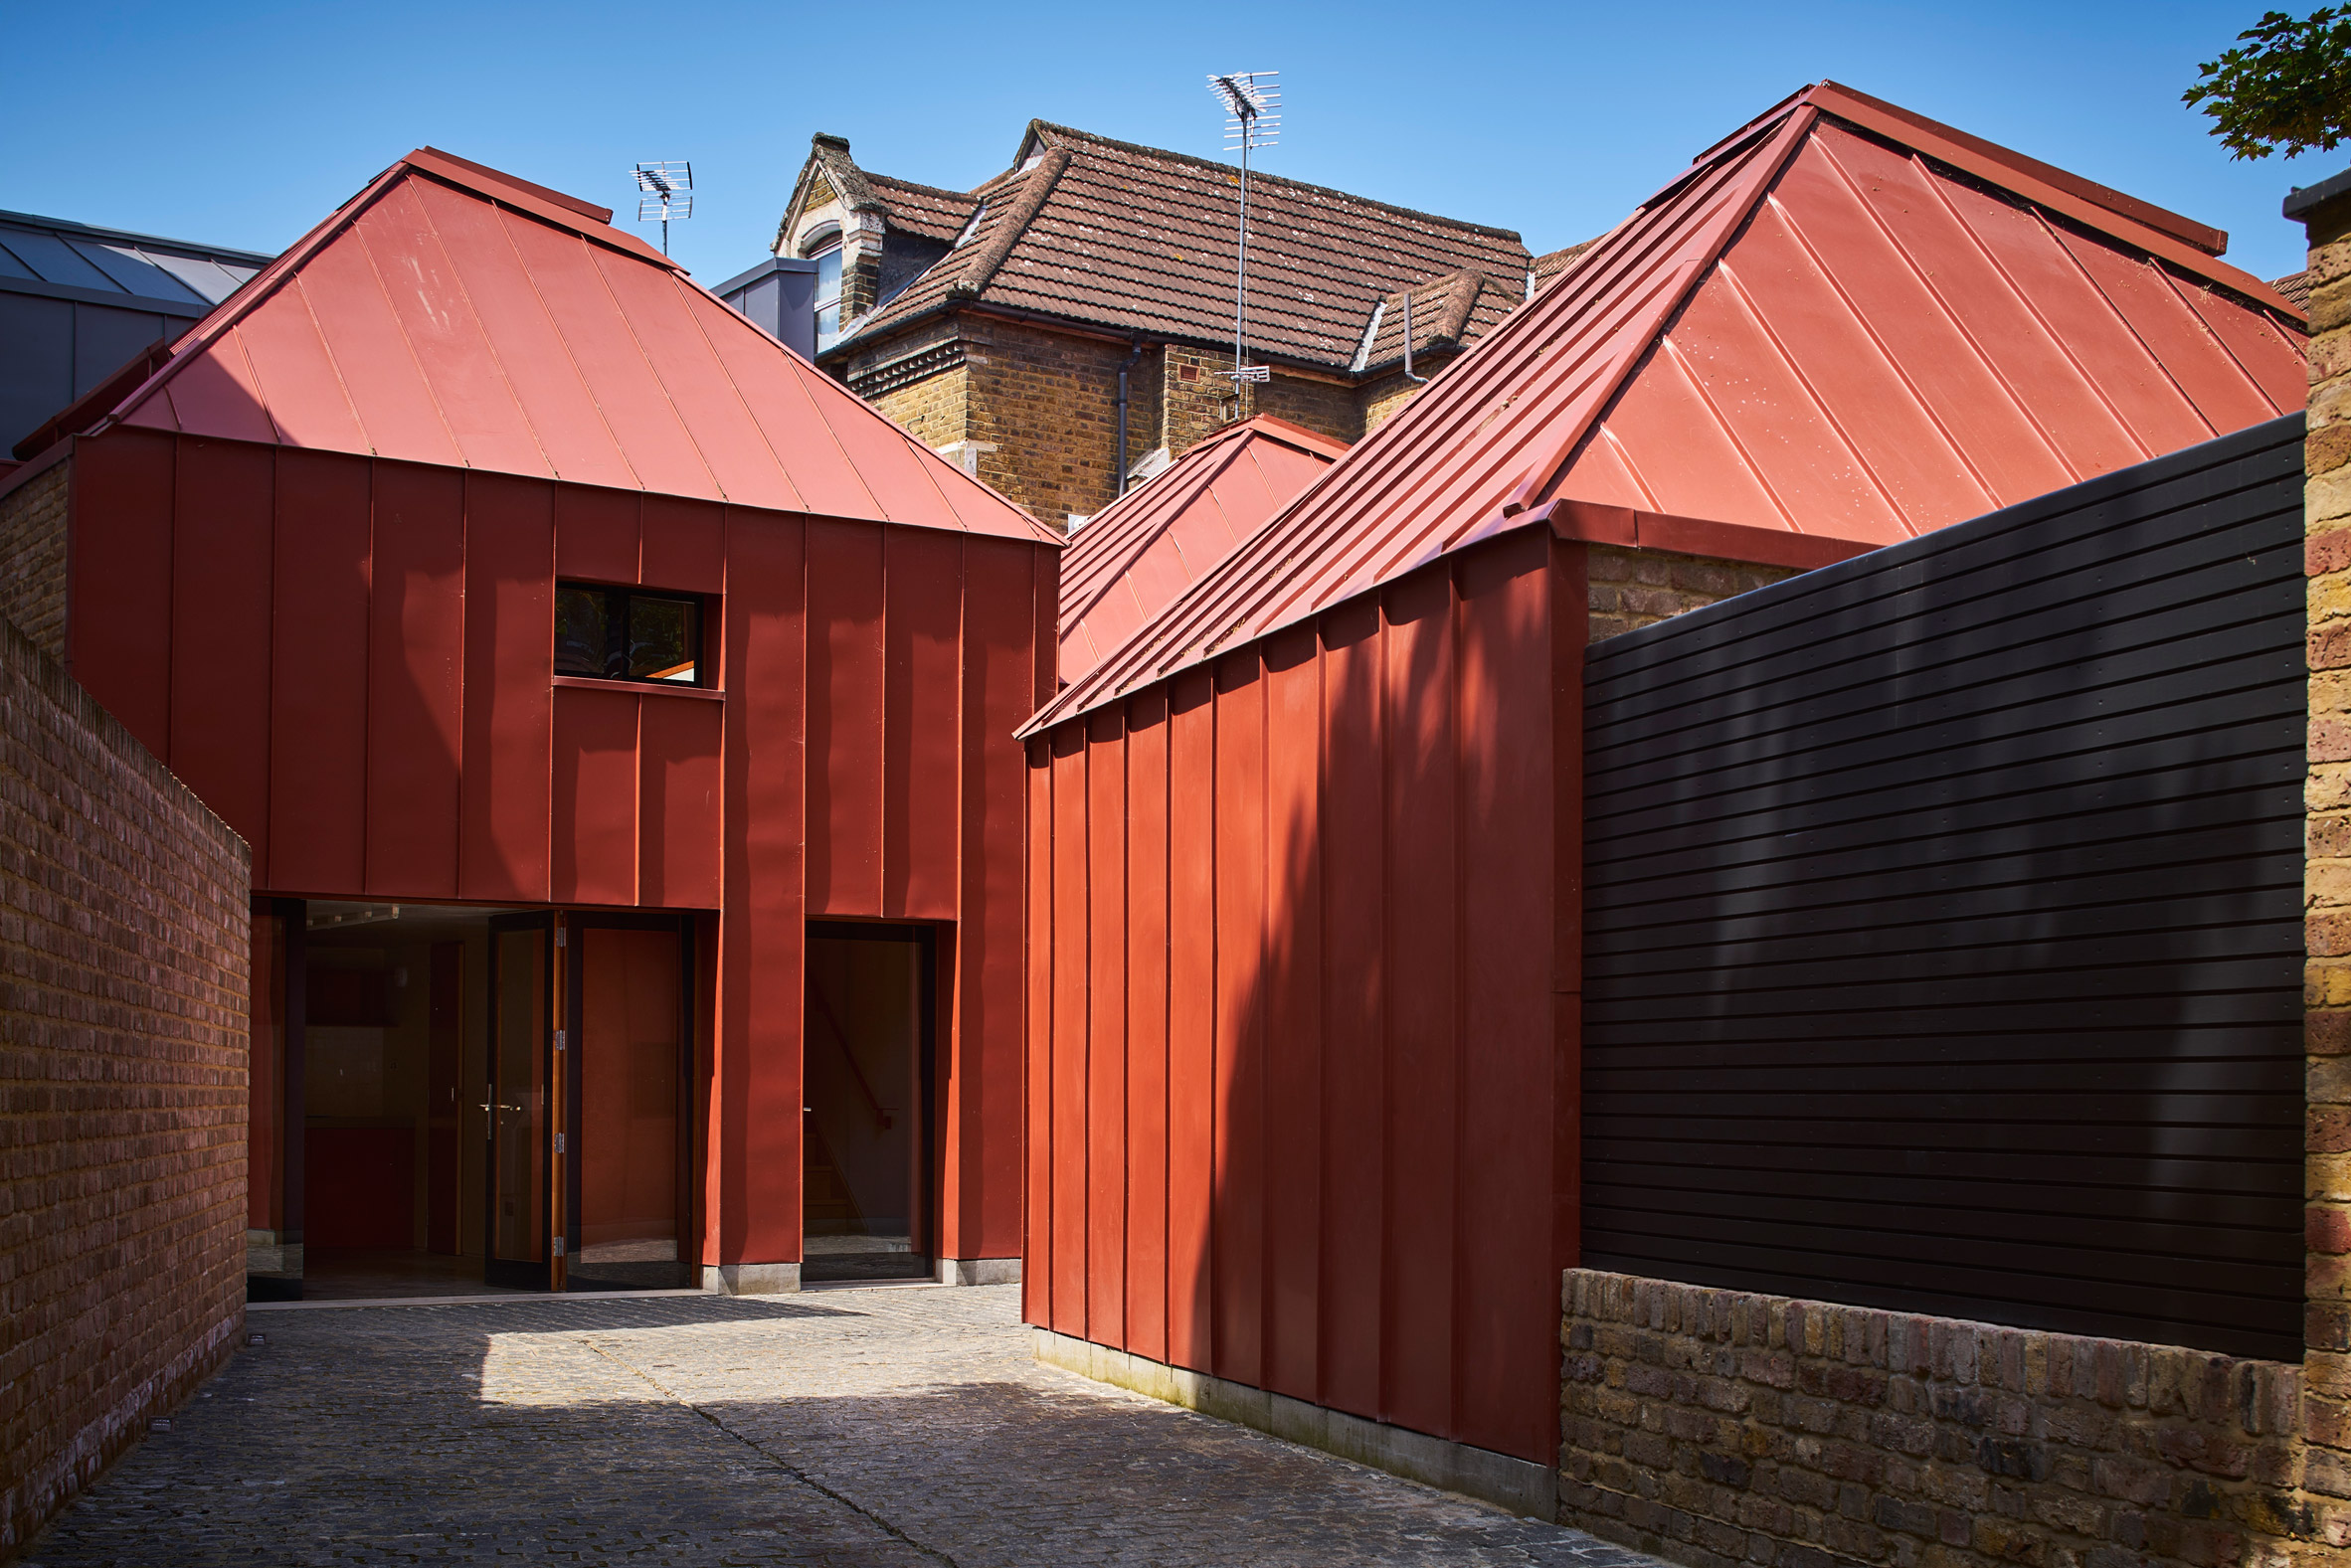 Red pyramidal rooms form Henning Stummel's London home